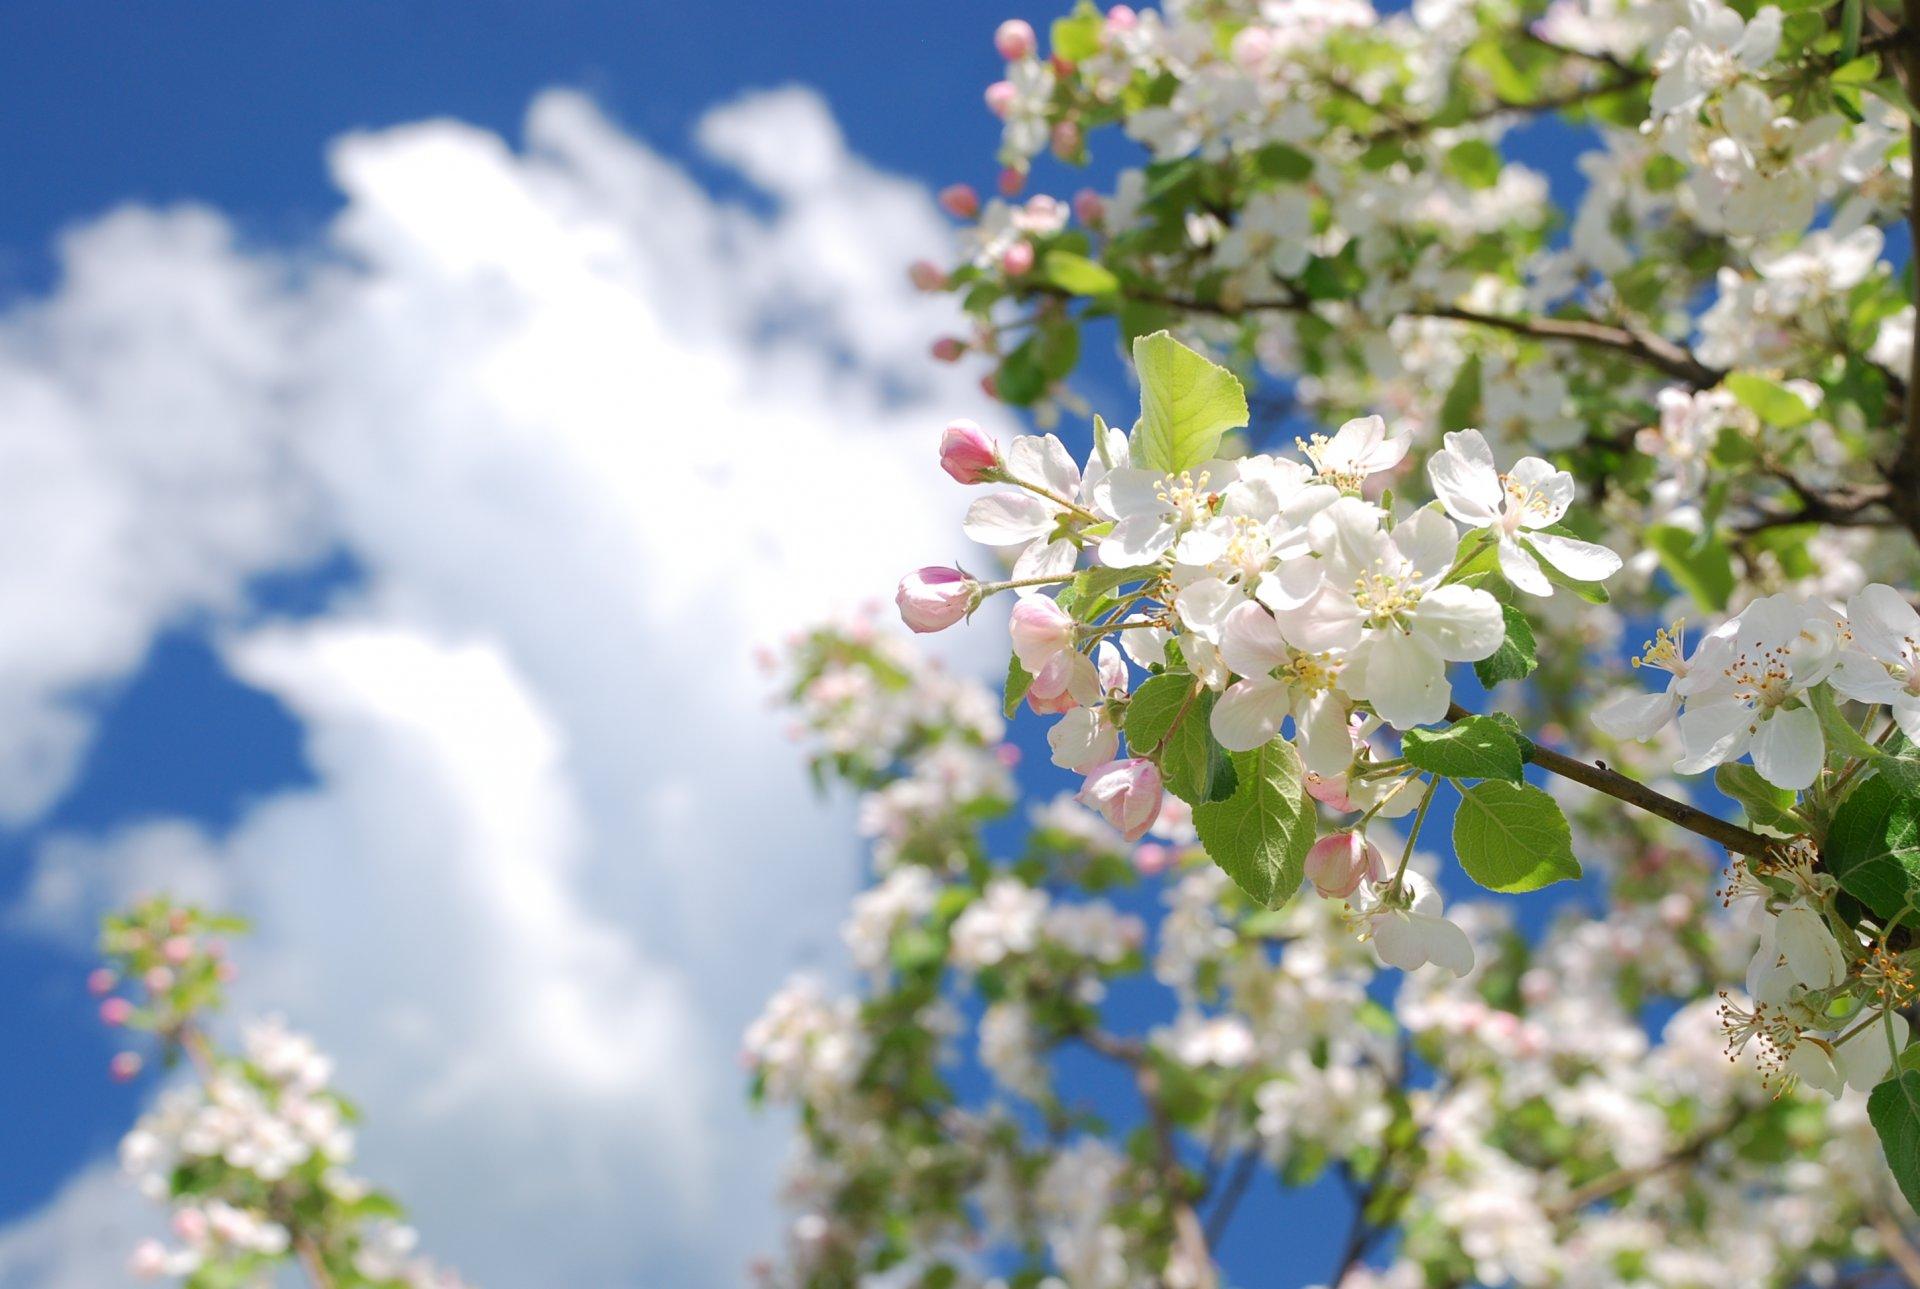 Картинки о природе весной